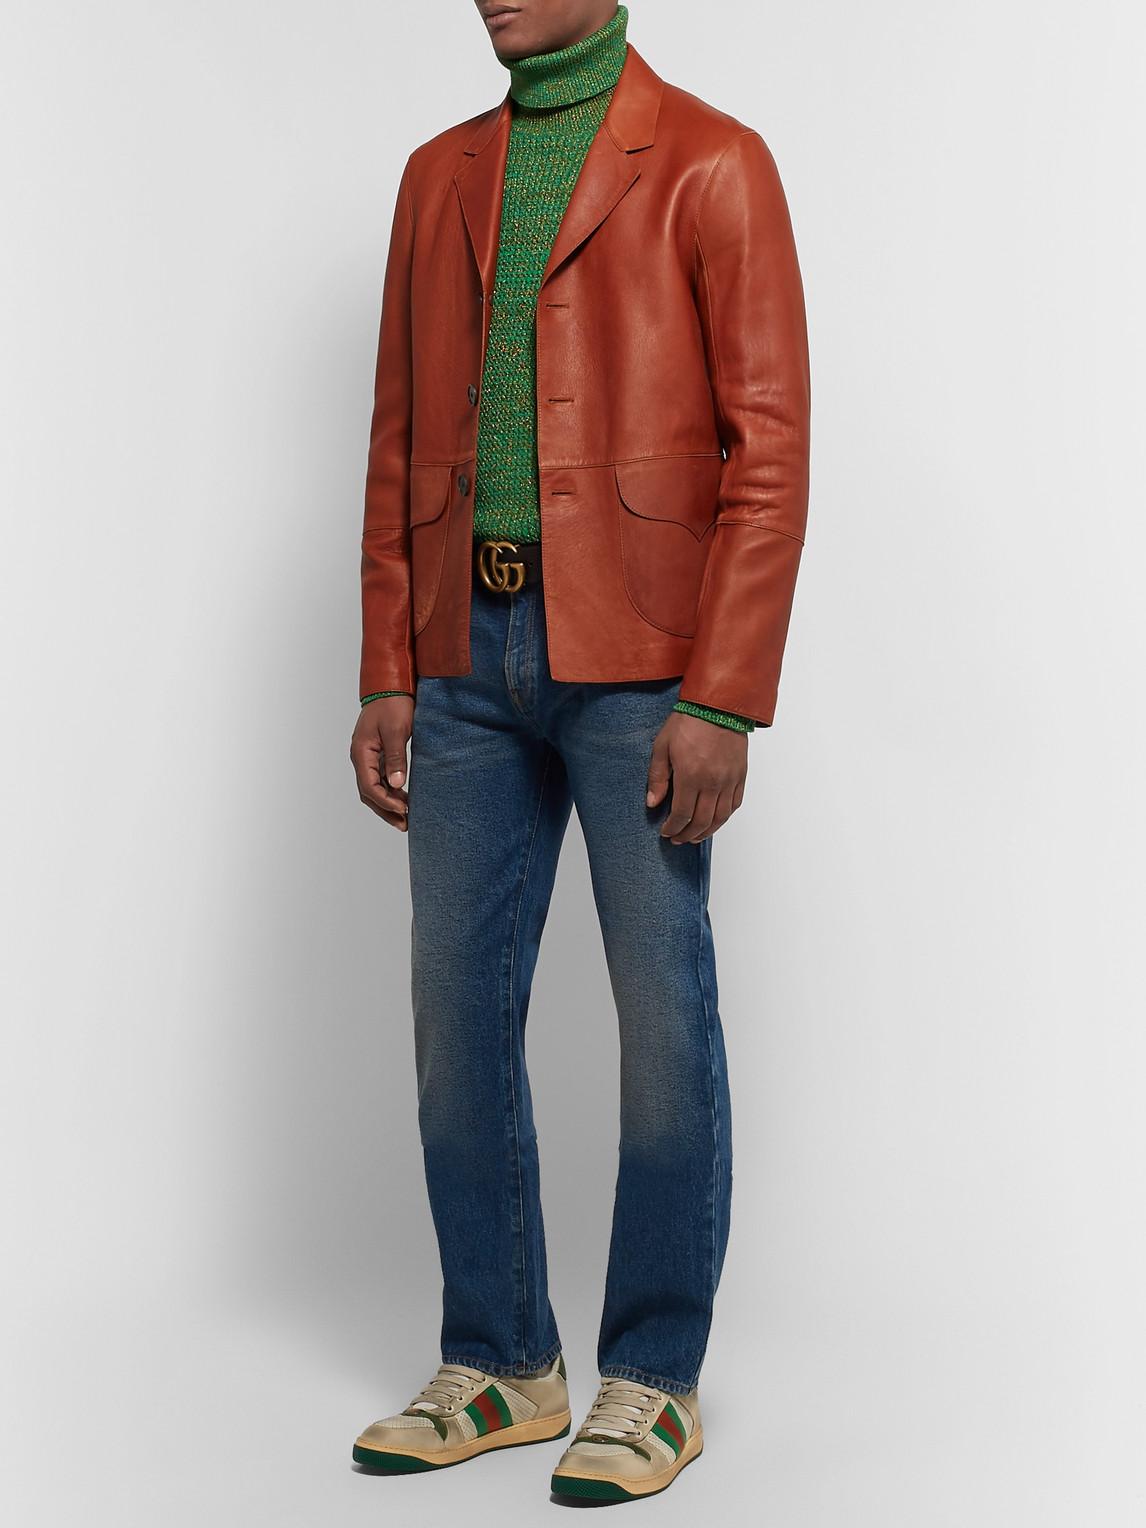 Gucci Sweaters SLIM-FIT METALLIC MÉLANGE COTTON-BLEND ROLLNECK SWEATER